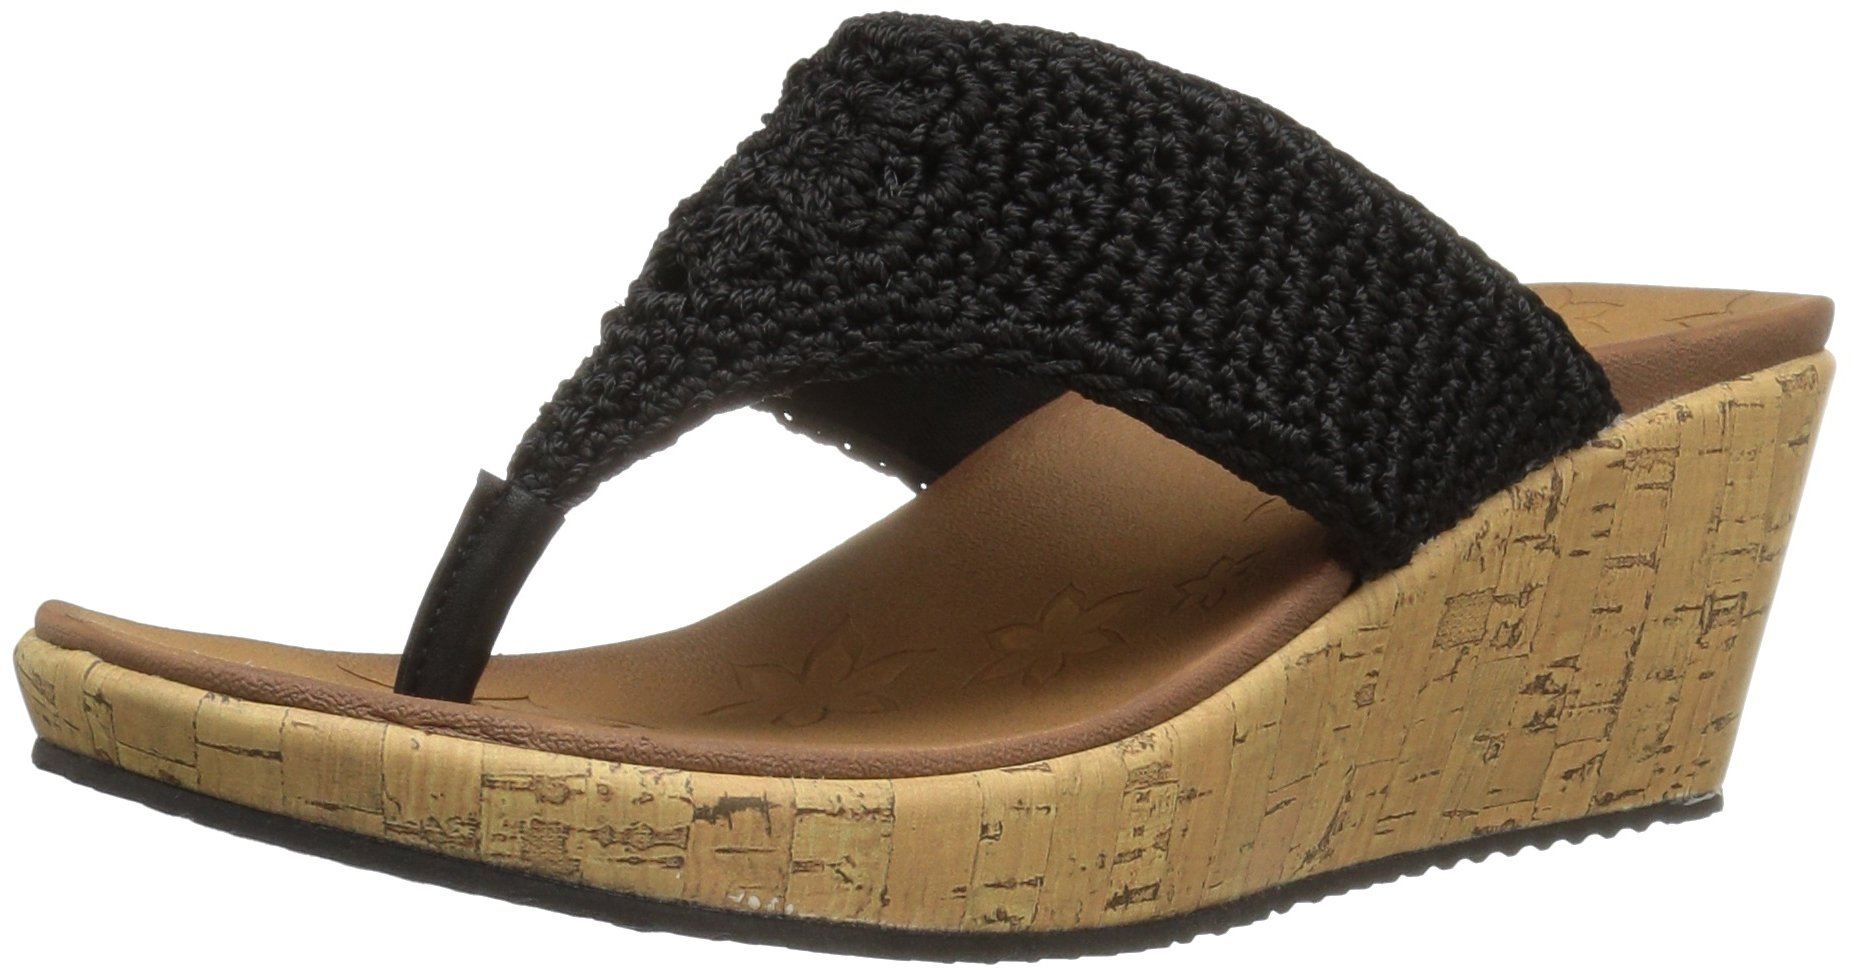 Skechers Cali Women's Beverlee Wedge Sandal,Black Crochet,9 M US